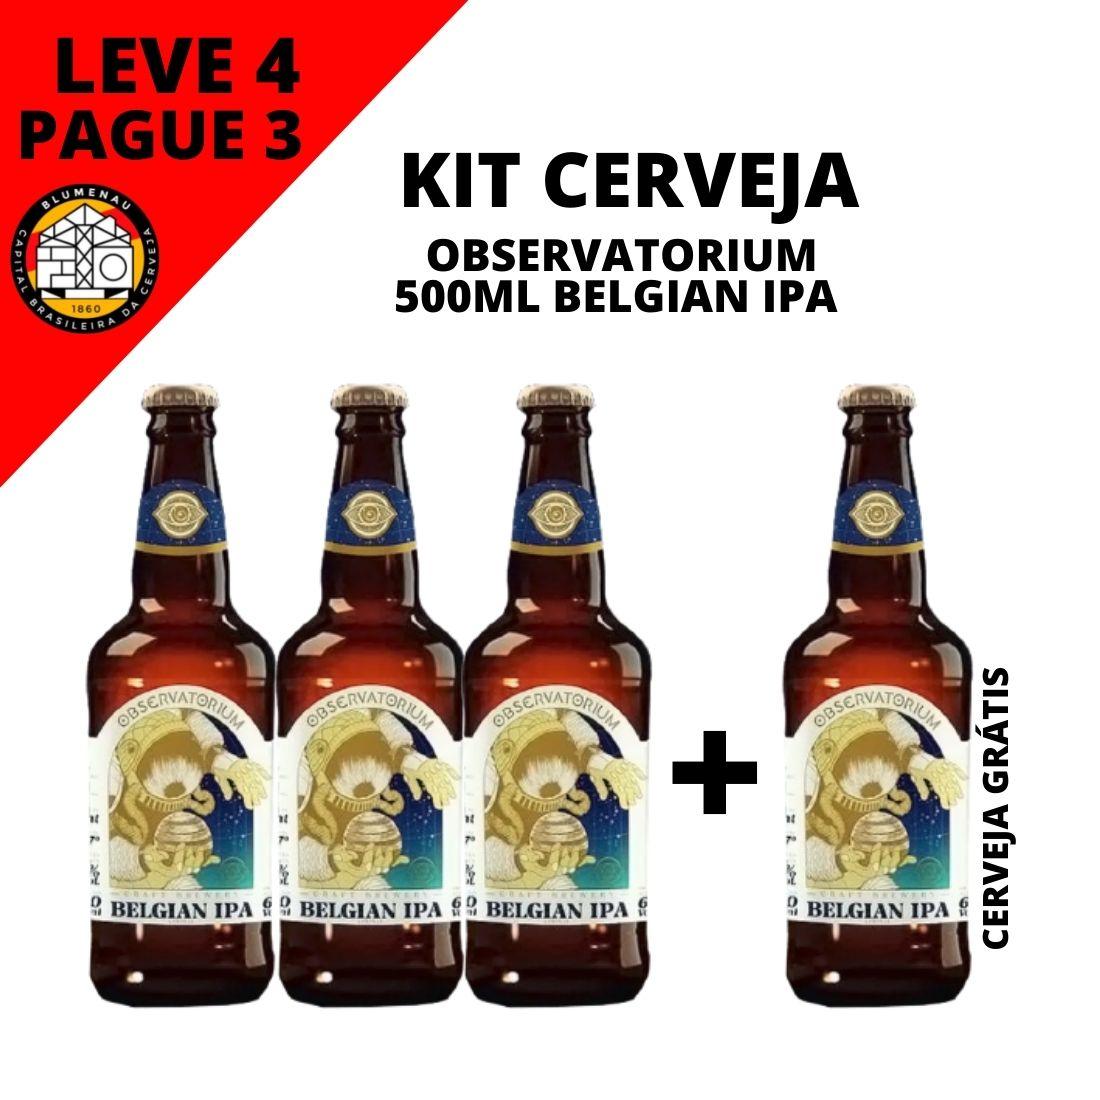 Kit Cervejas Observatorium Leve 4 Pague 3